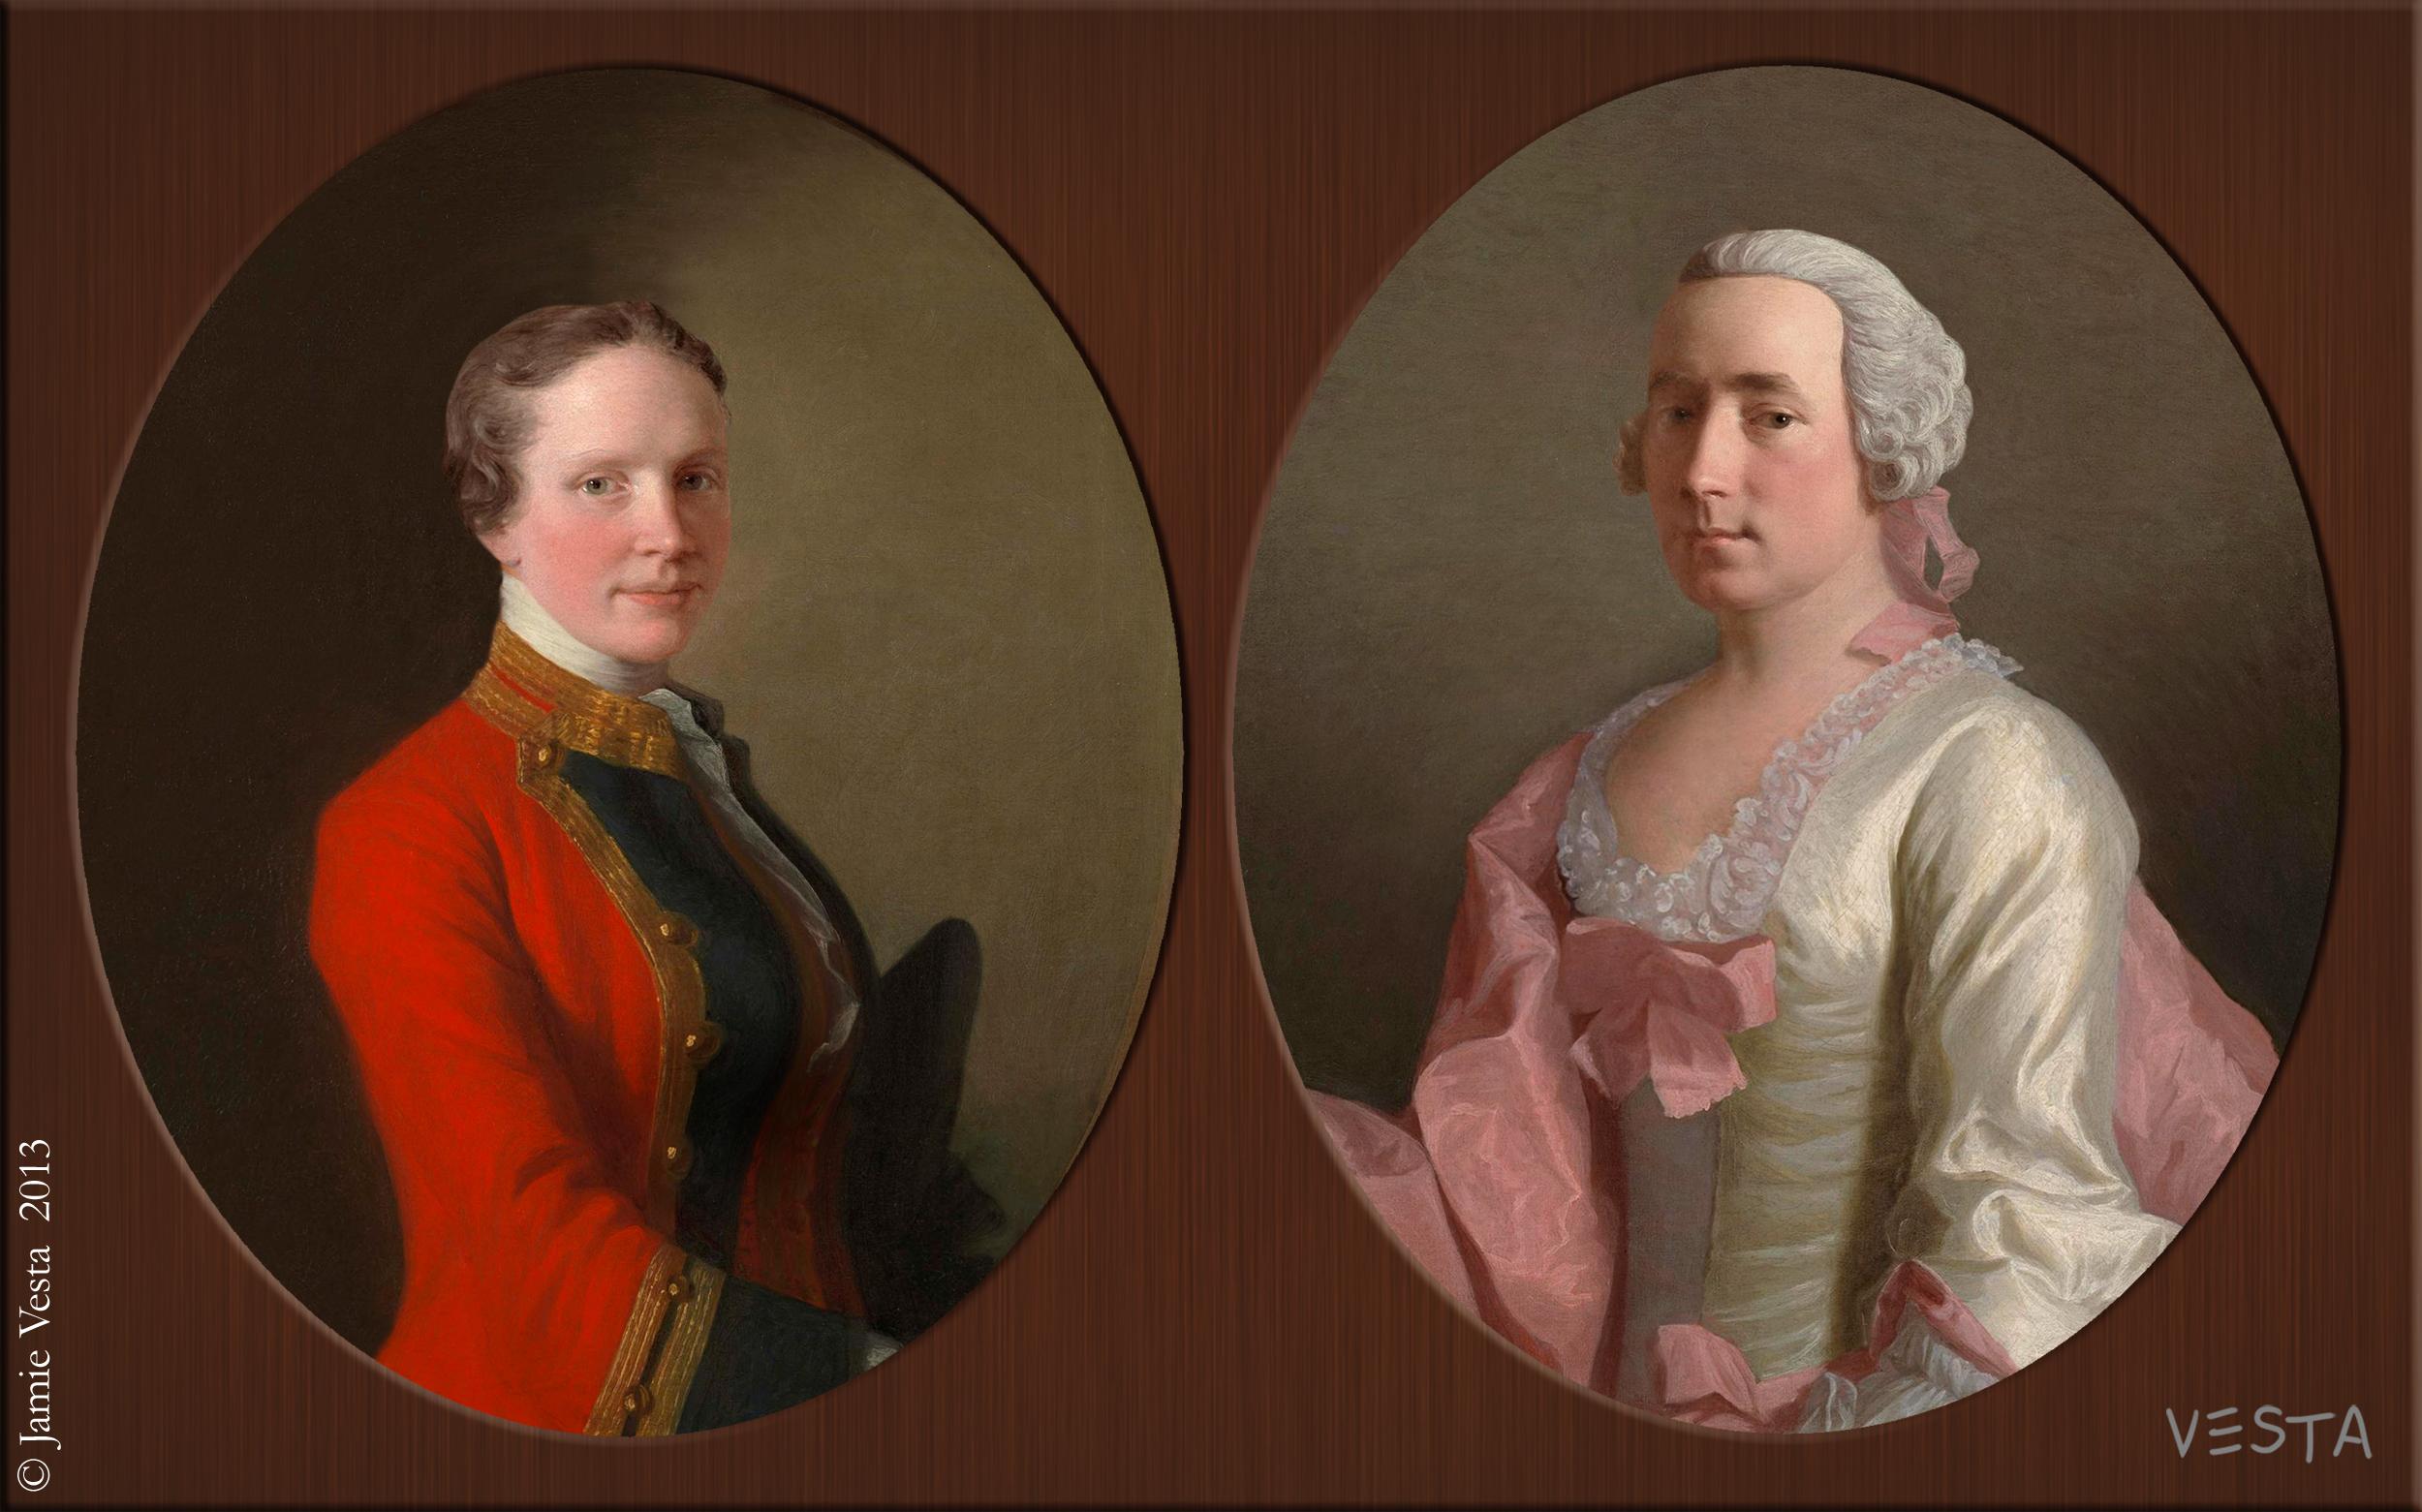 eve s rib 18th century couple 18th century couple